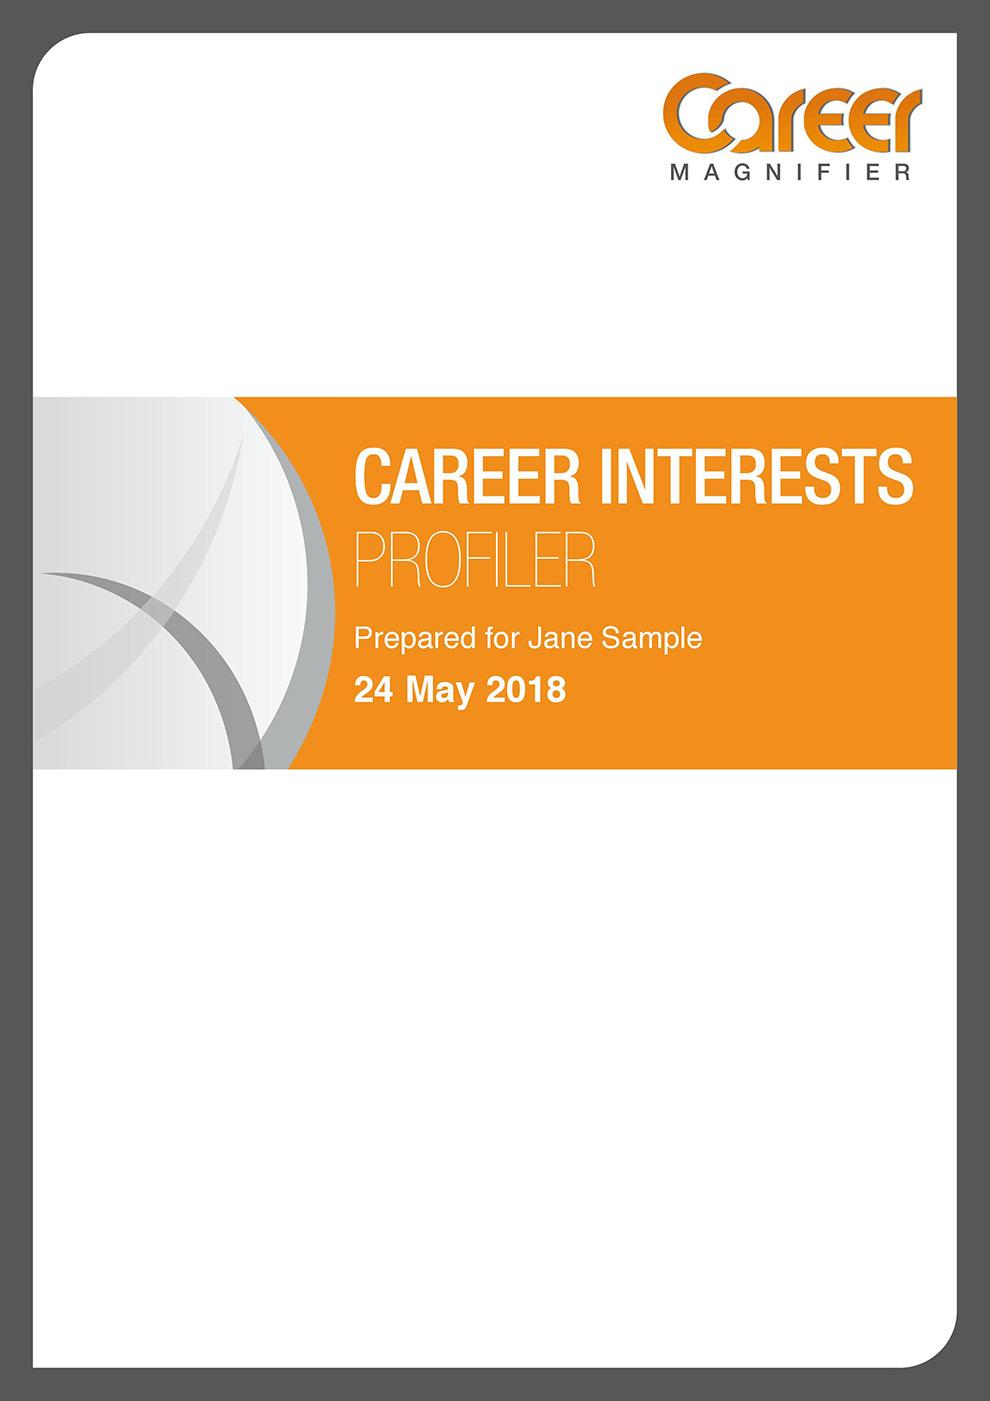 Sample Career Essment | Sample Career Interests Report Career Magnifier